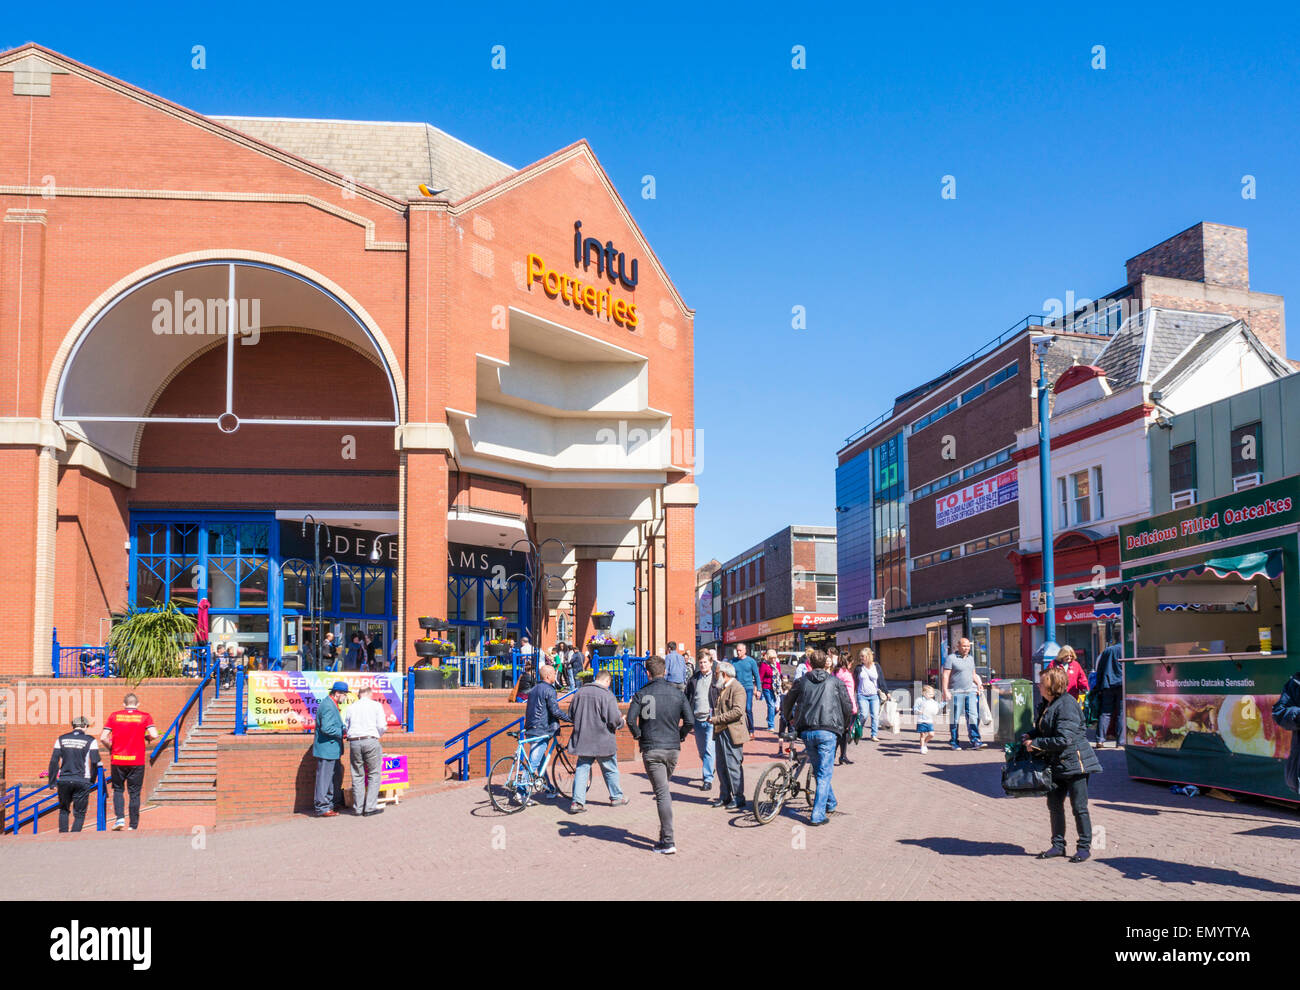 Intu Potteries shopping centre City Centre Stoke on Trent Staffordshire England GB UK EU Europe - Stock Image